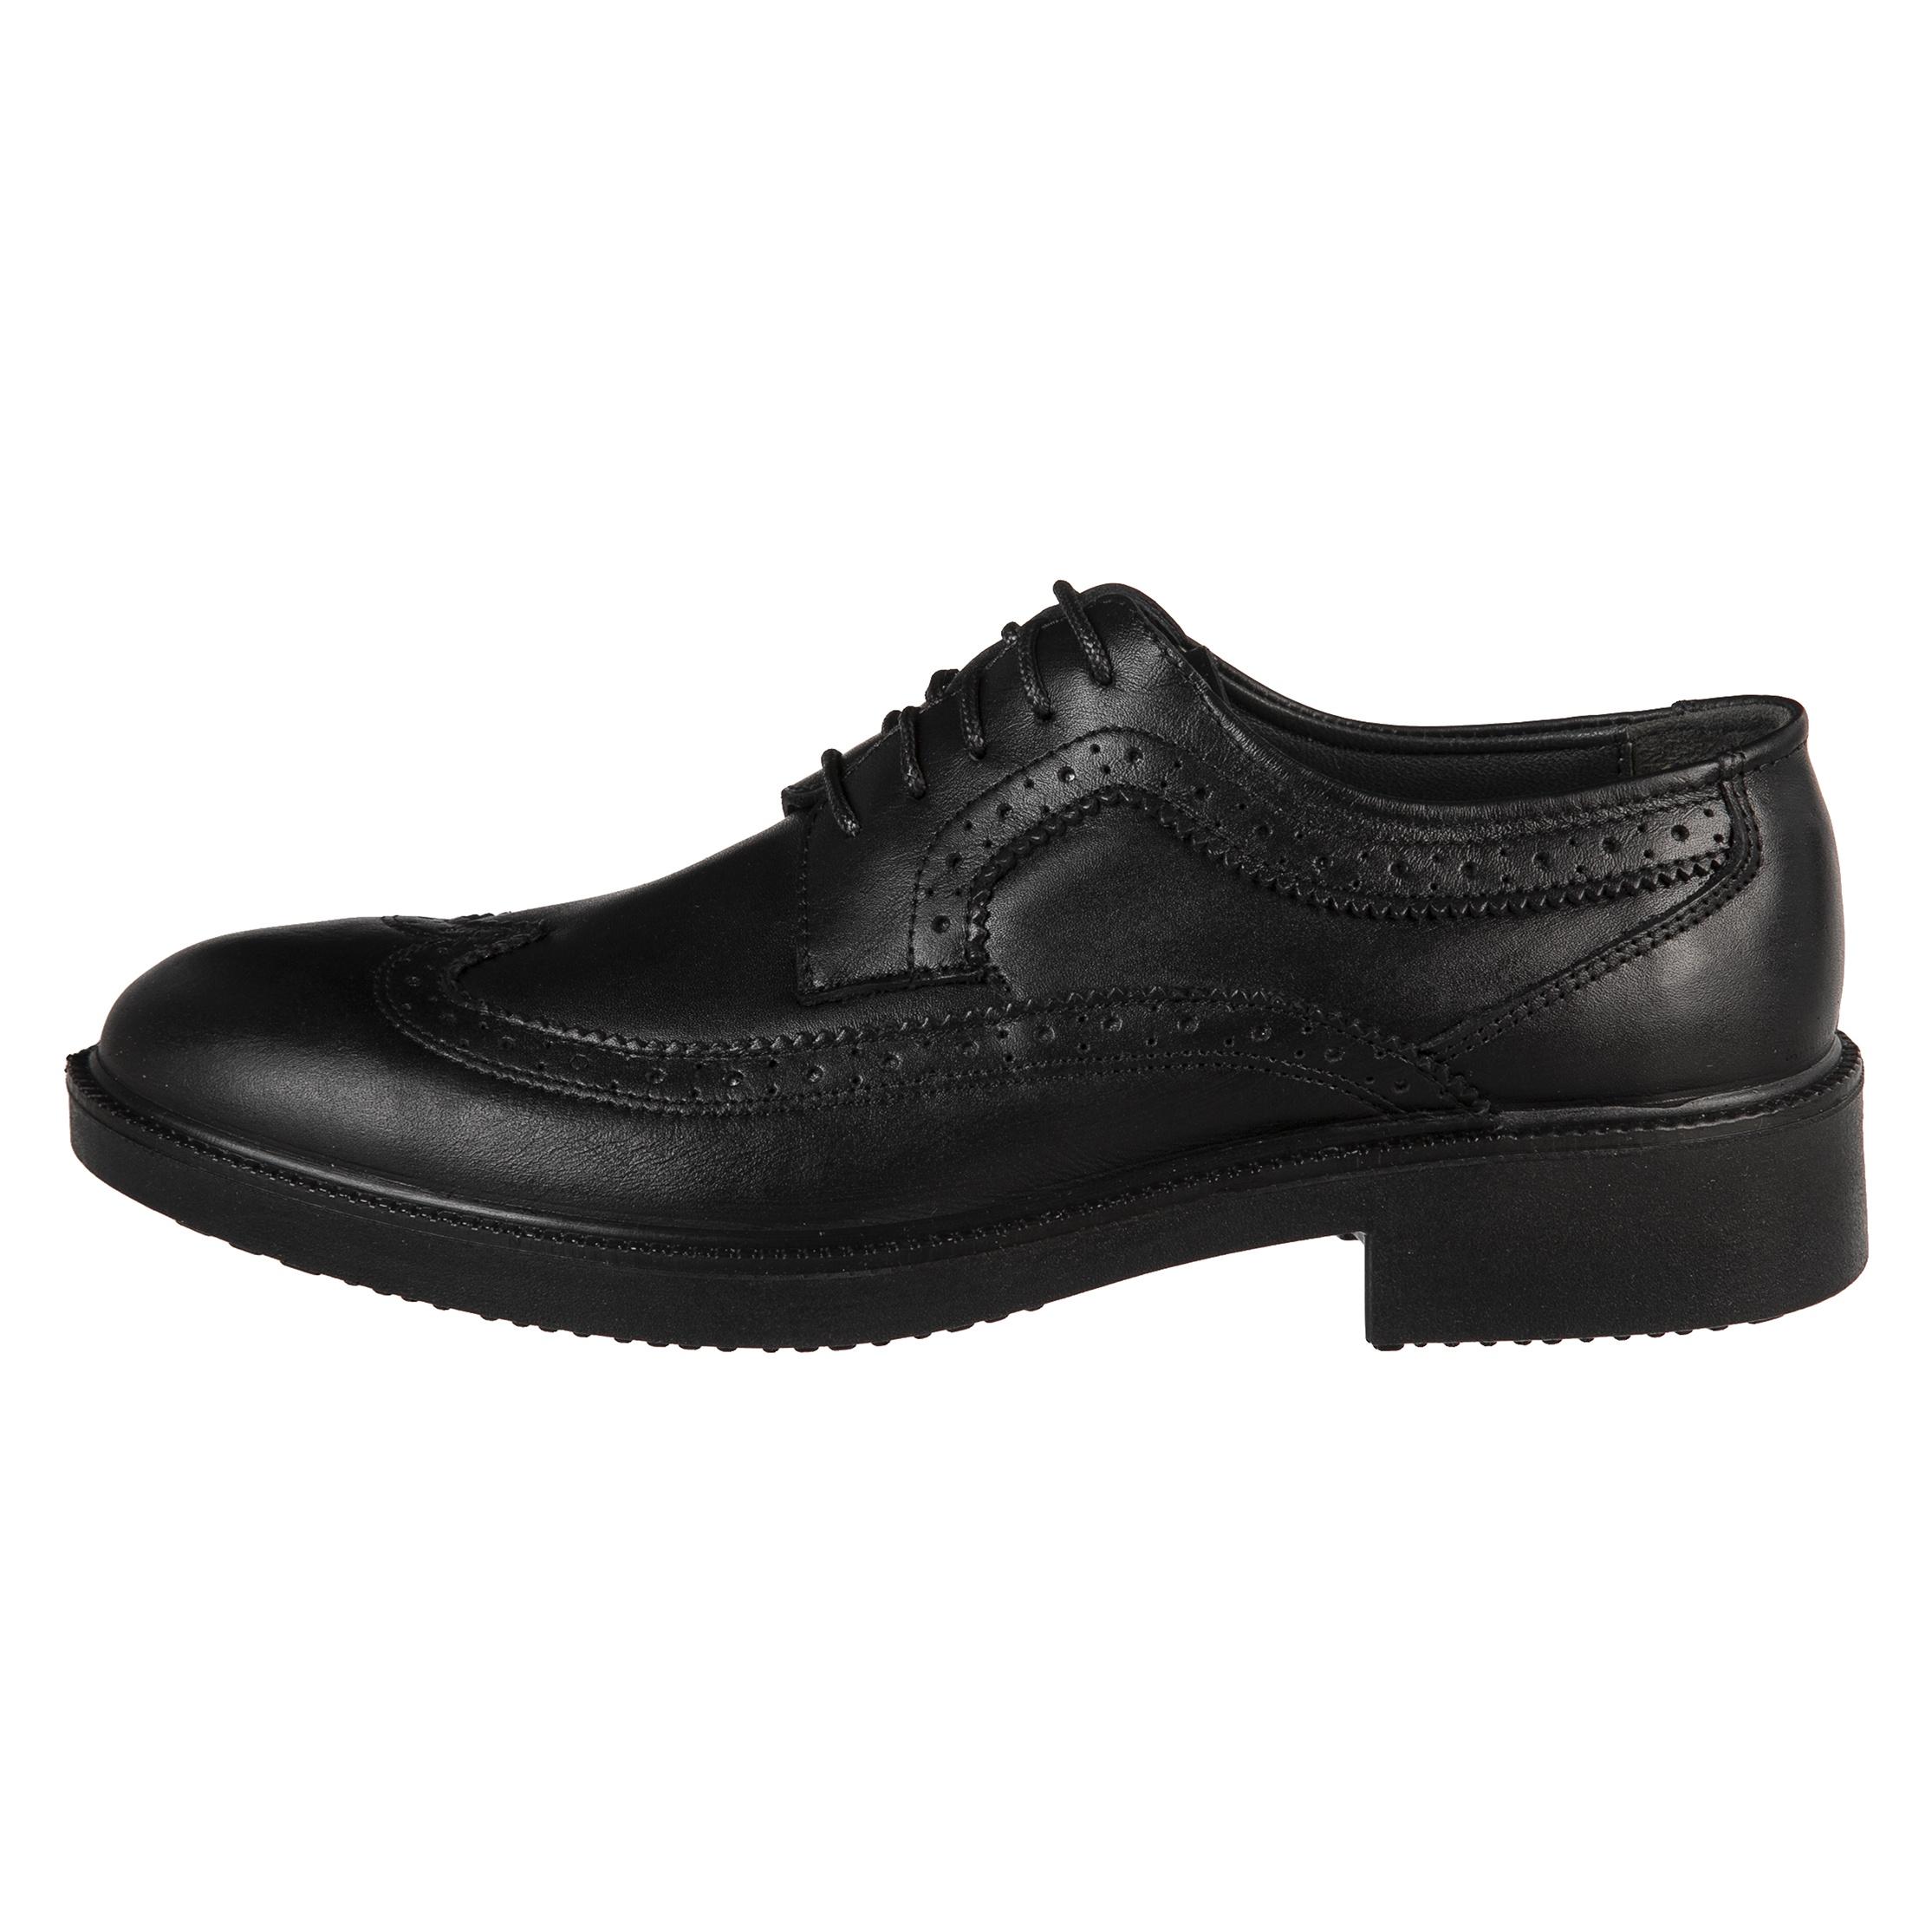 کفش روزمره مردانه ریمکس مدل 7226A503-101